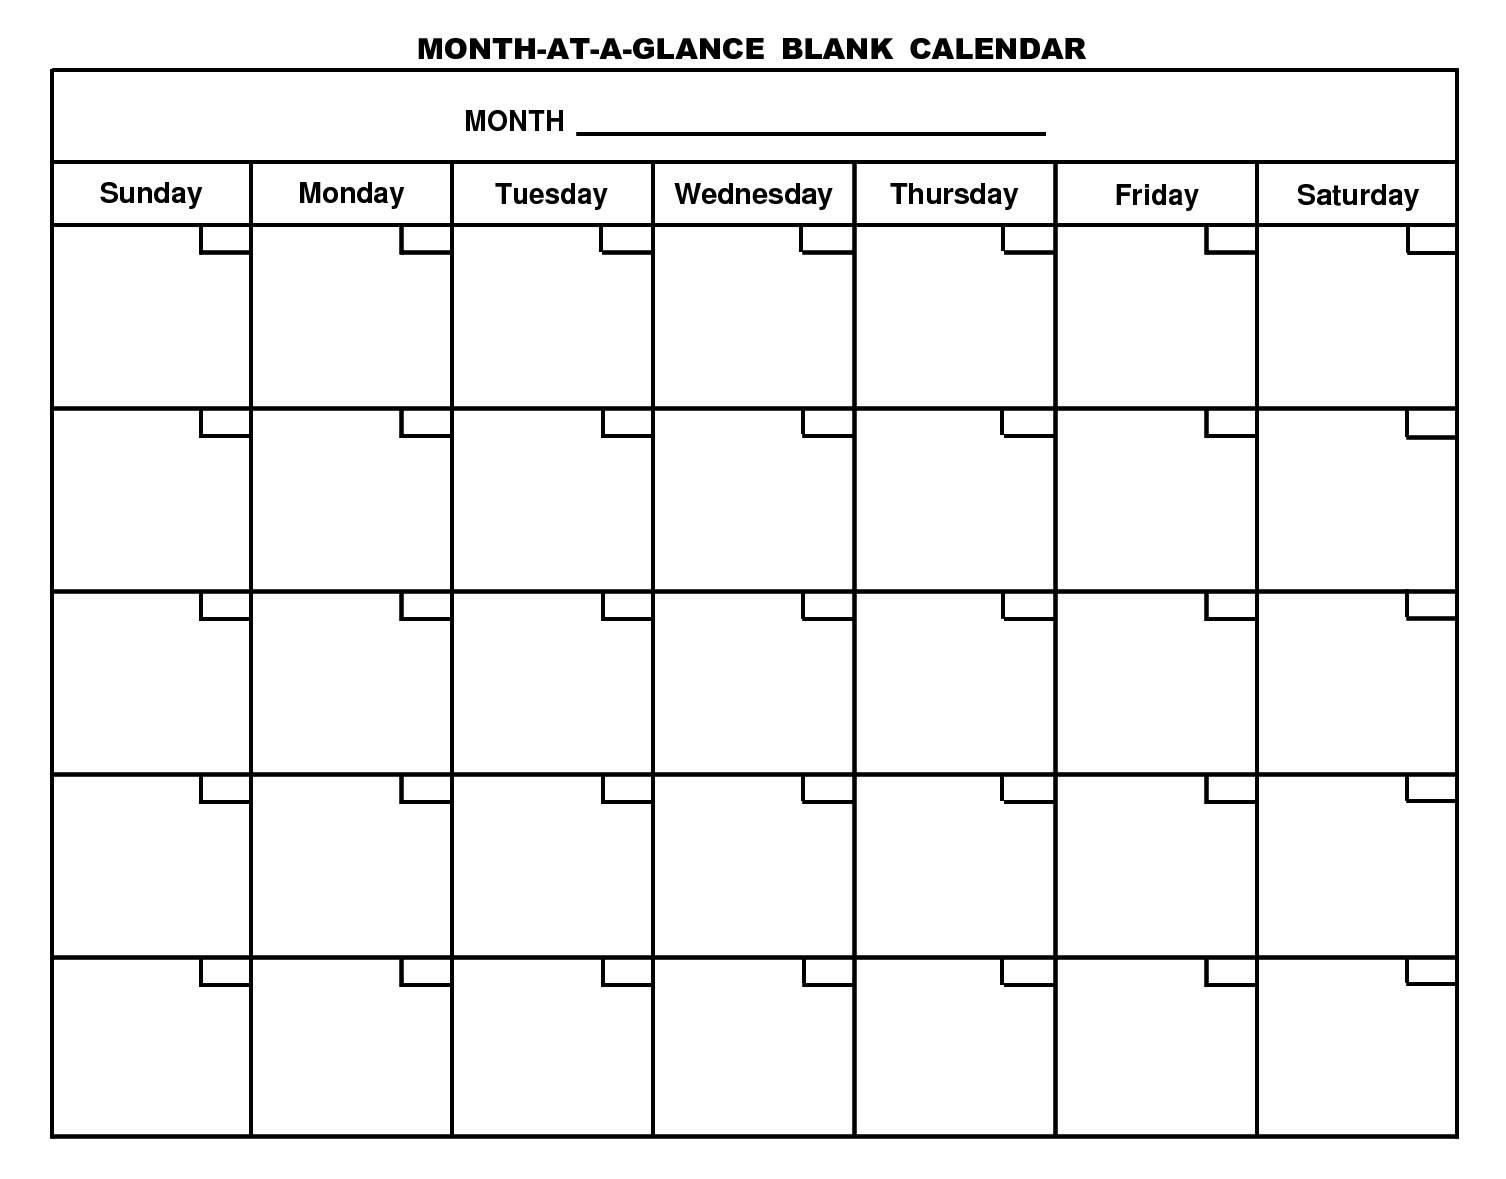 printable blank monthly calendar calendar month printable Free Printable Monthly Calendar With Lines erdferdf